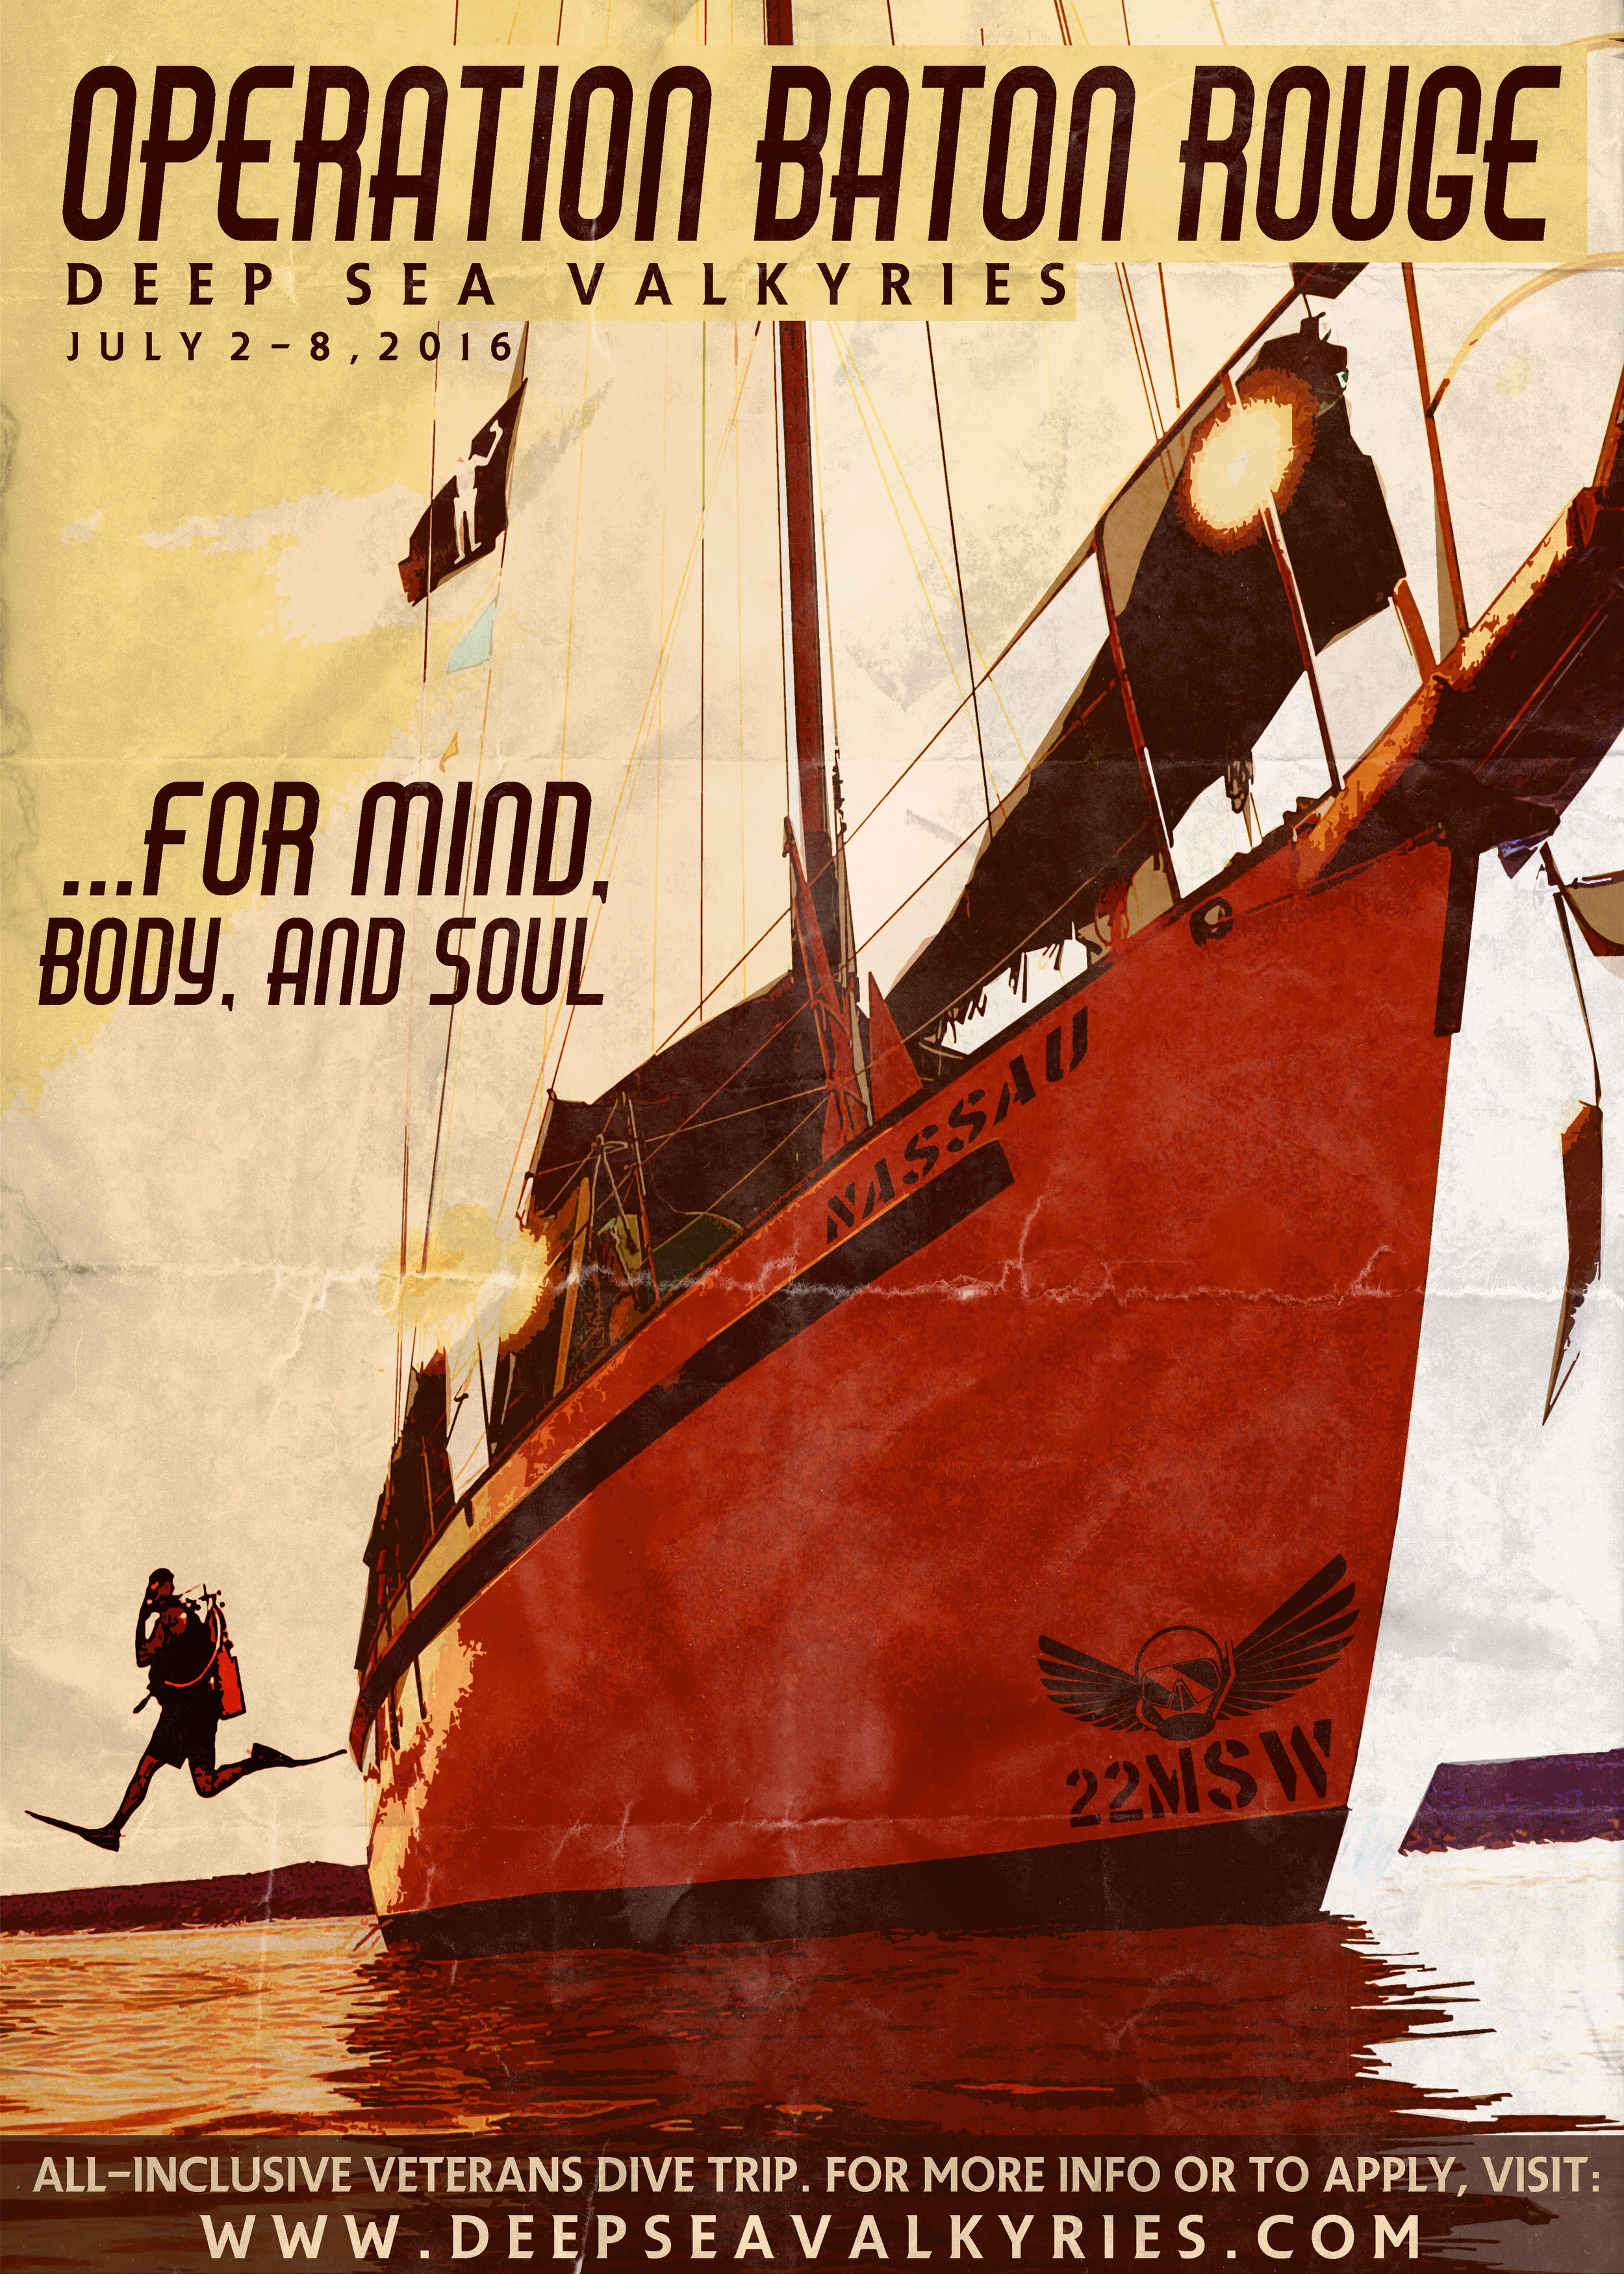 Operation-Baton-Rouge-Poster (2).jpg